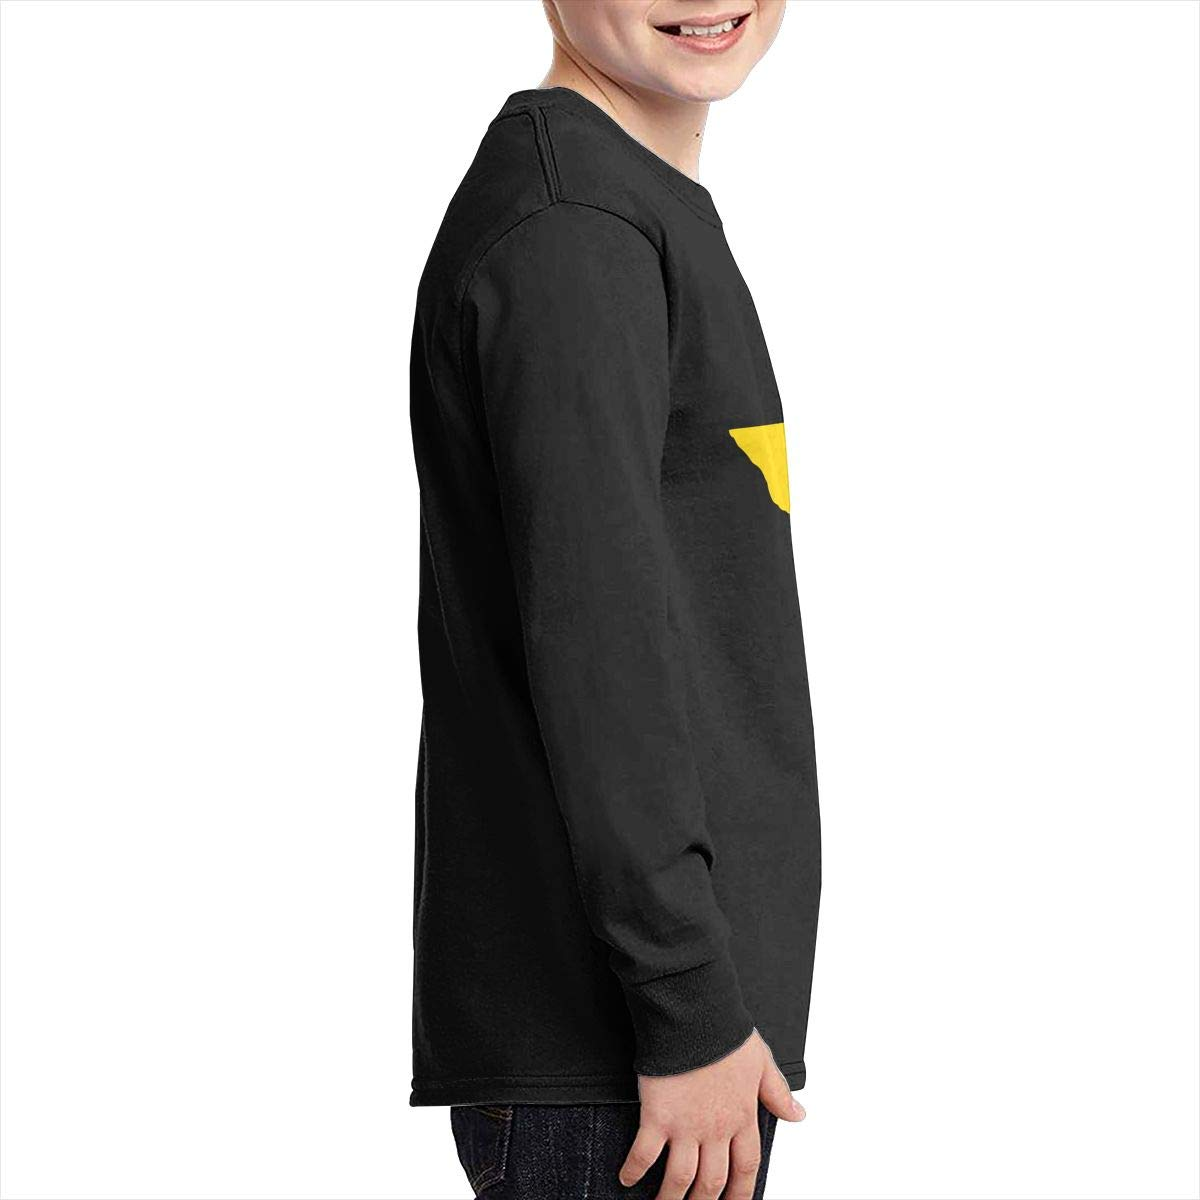 MiiyarHome Womens Long Sleeve Baseball T-Shirts Thanksgiving Lingerie Girls Raglan/Sleeves Jersey Tee Shirt Black